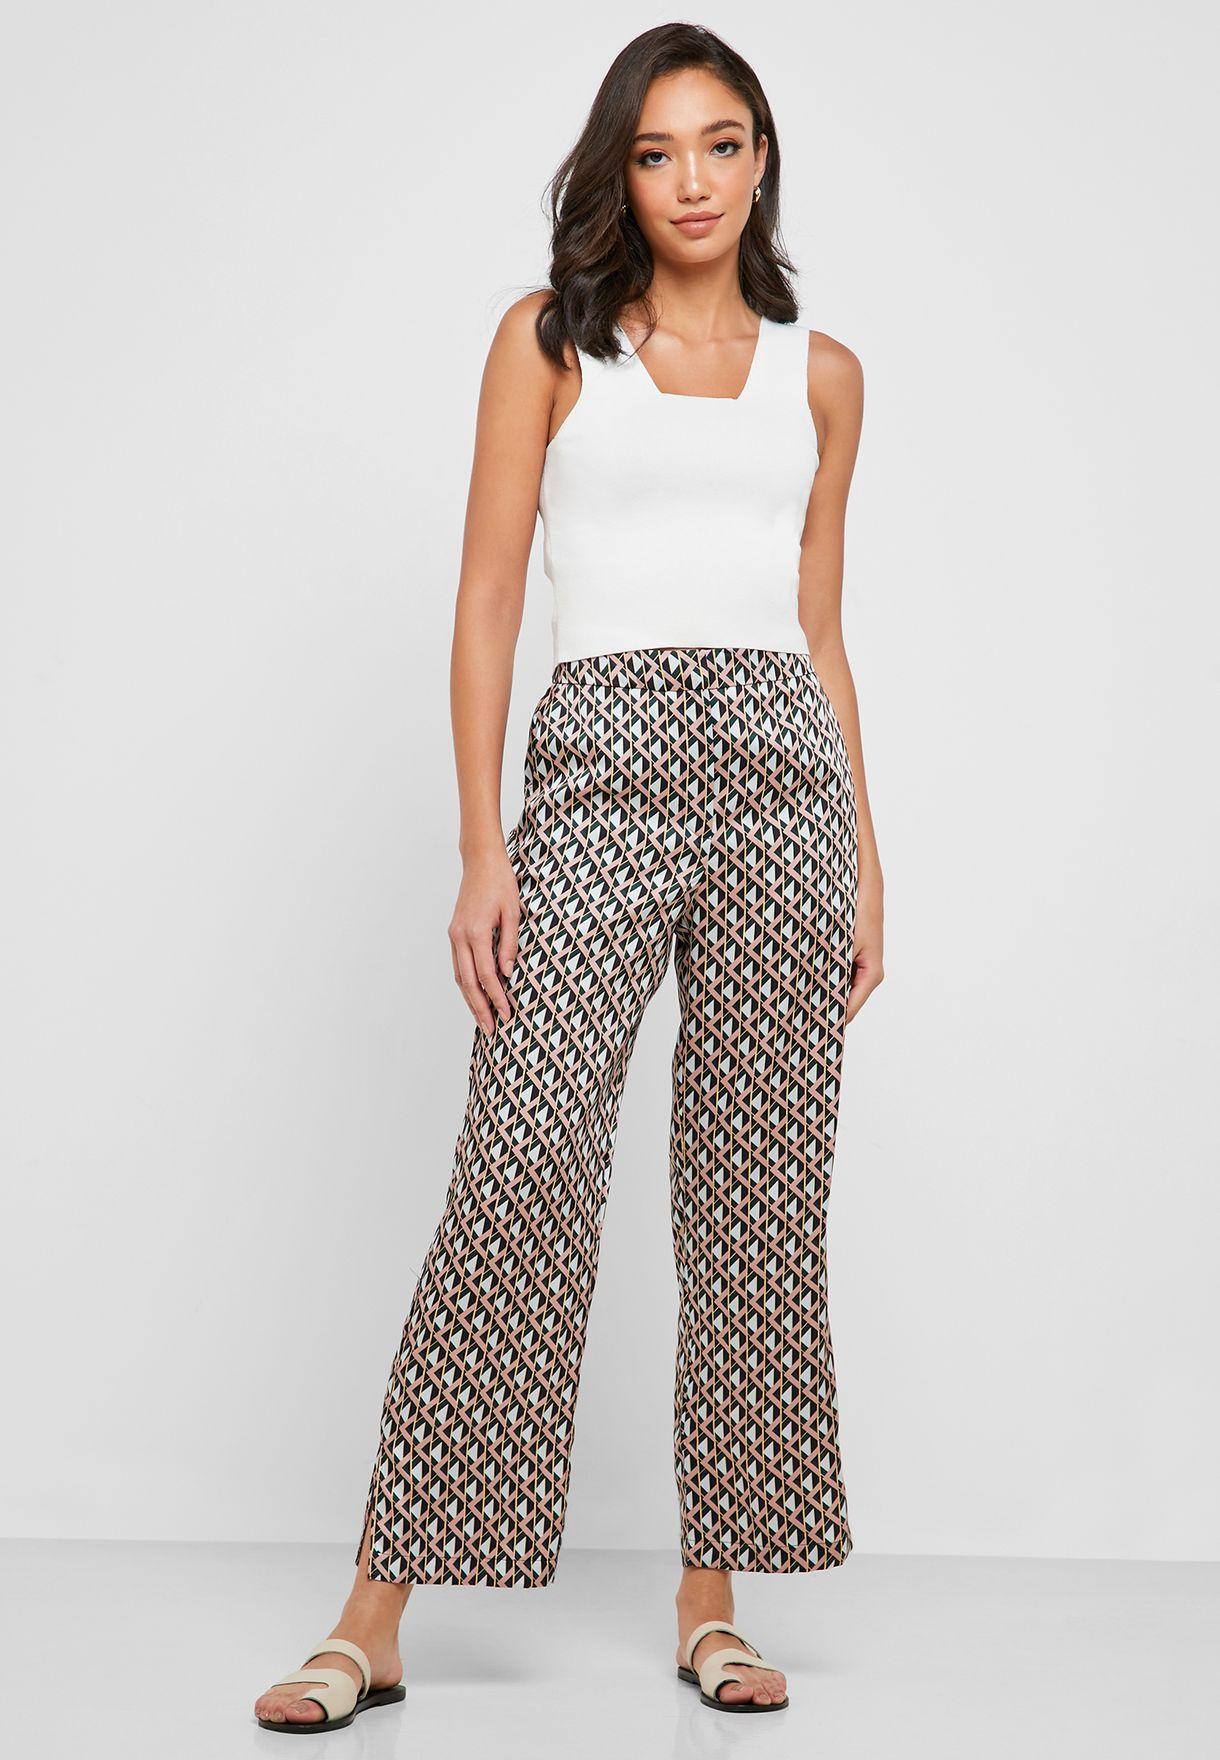 High Waist Side Slit Printed Pants